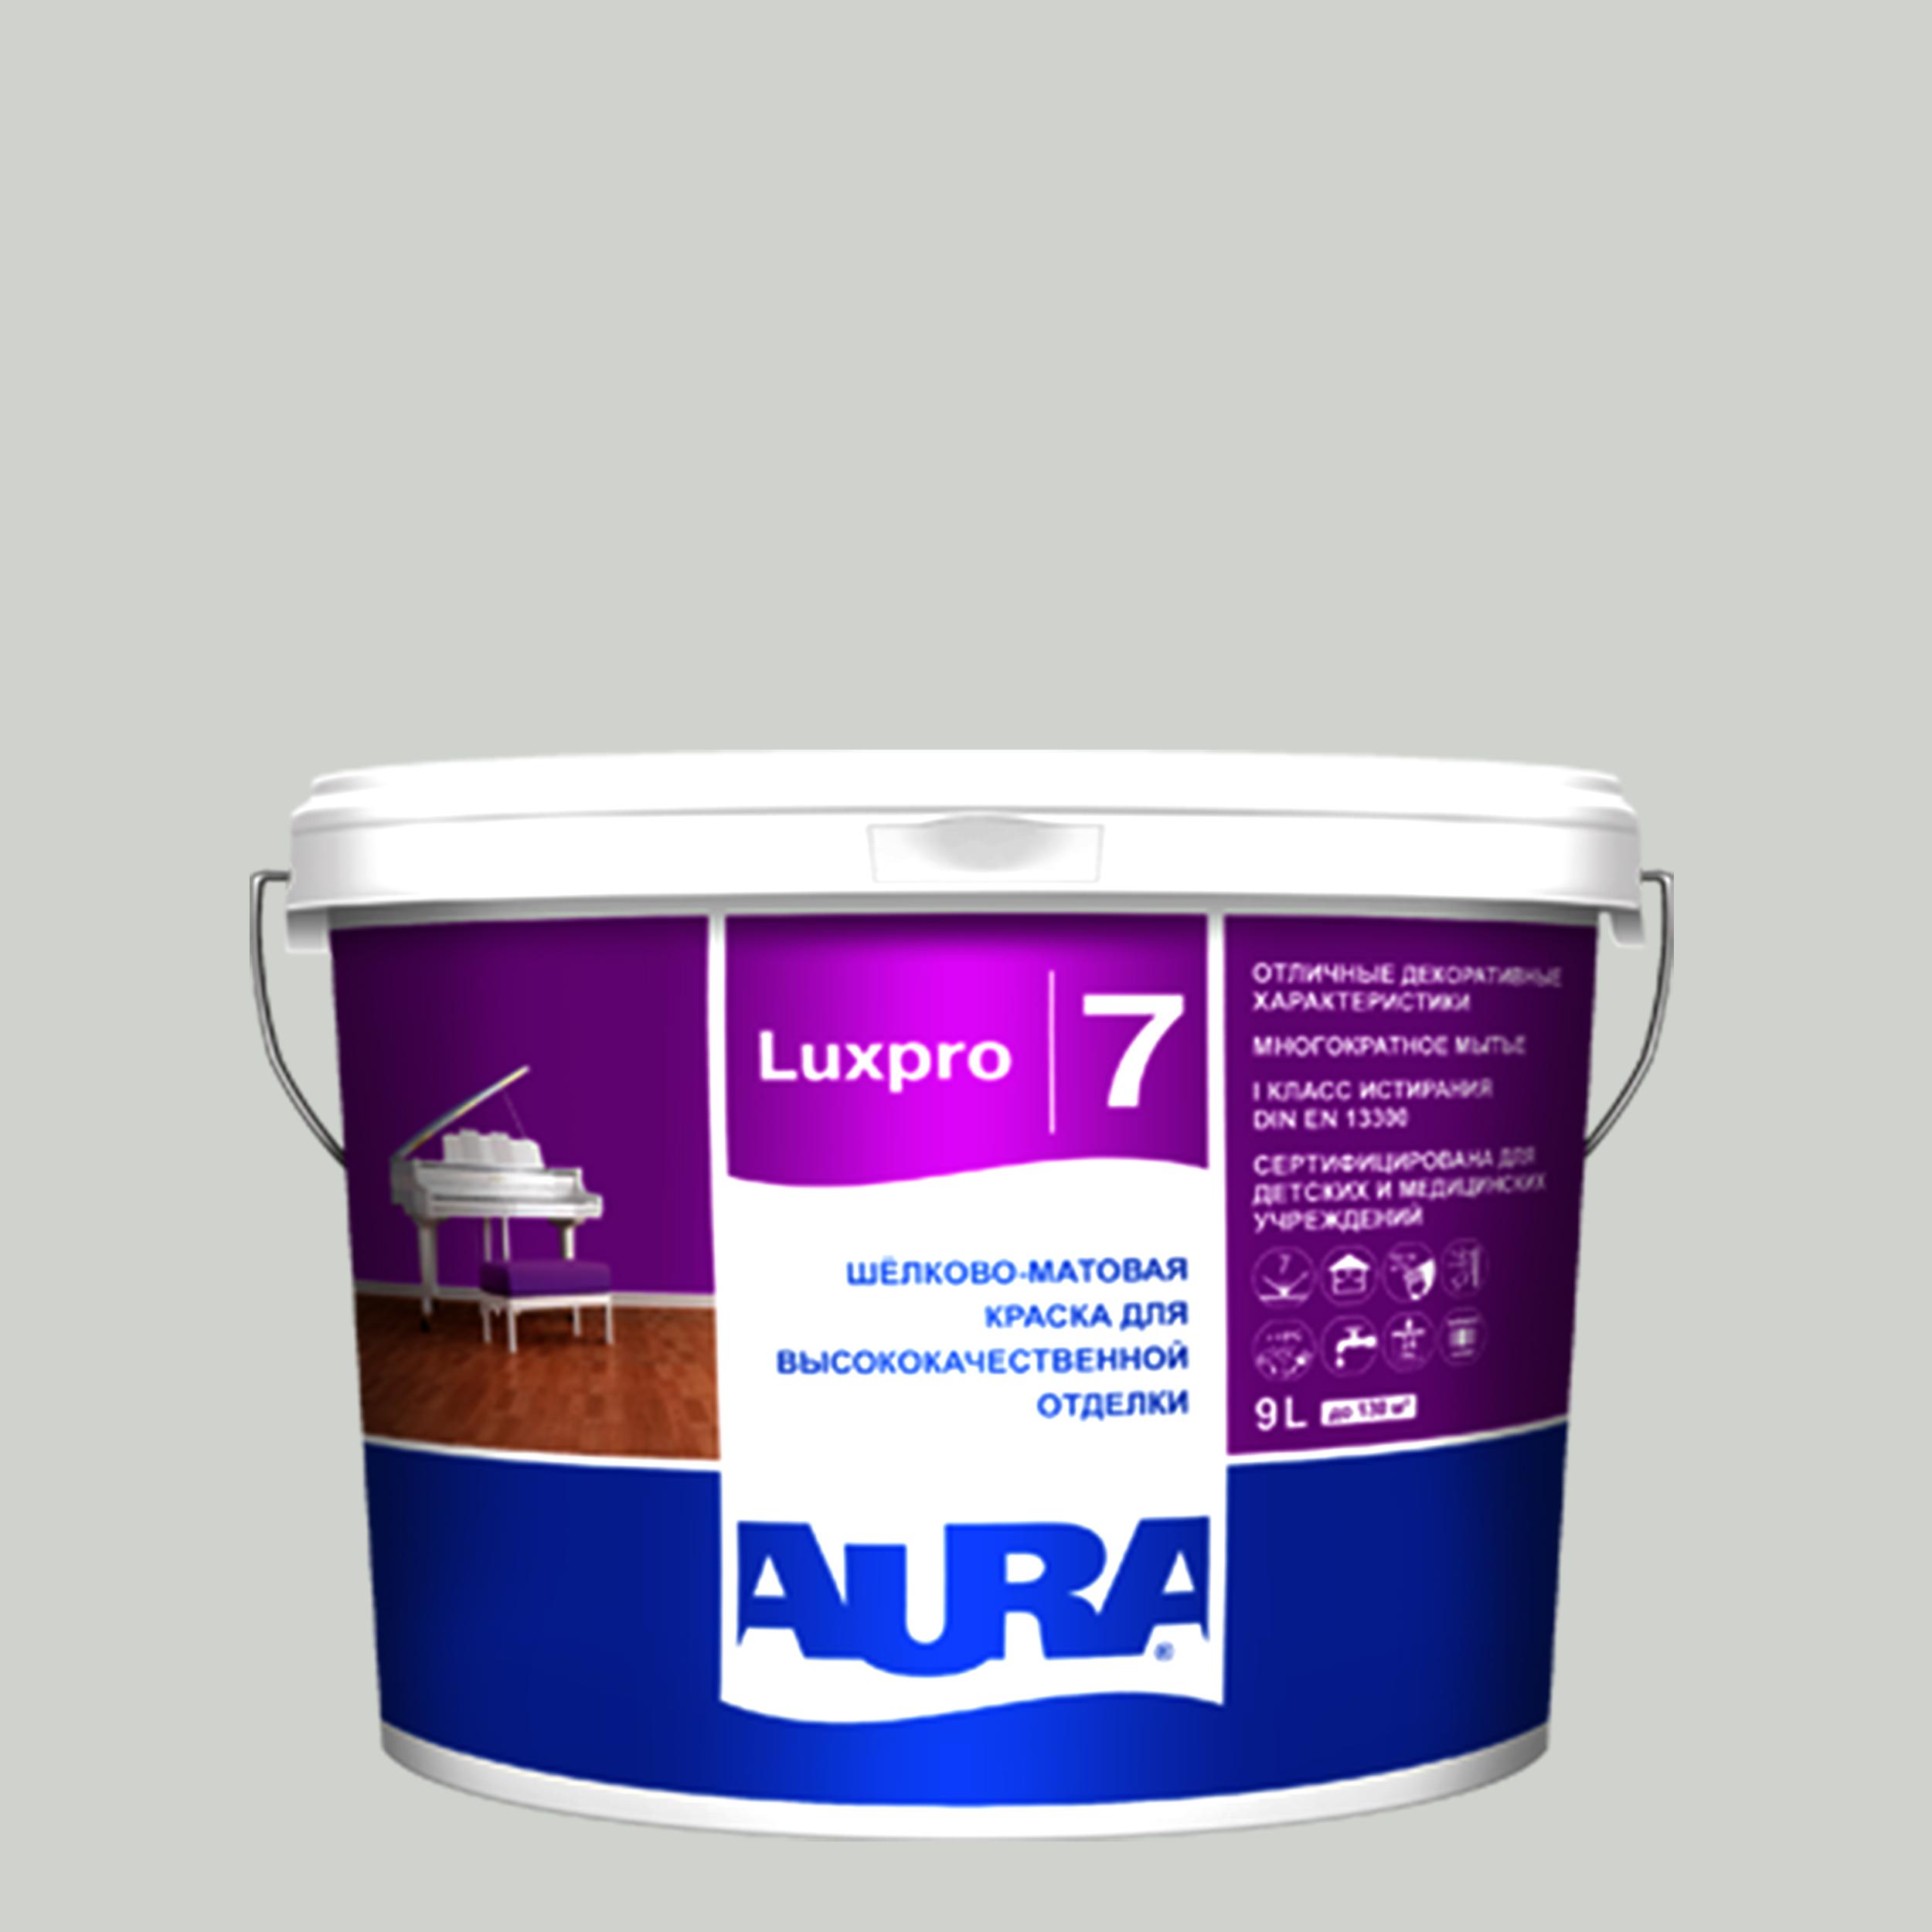 Фото 5 - Краска интерьерная, Aura LuxPRO 7, RAL 6007, 11 кг.